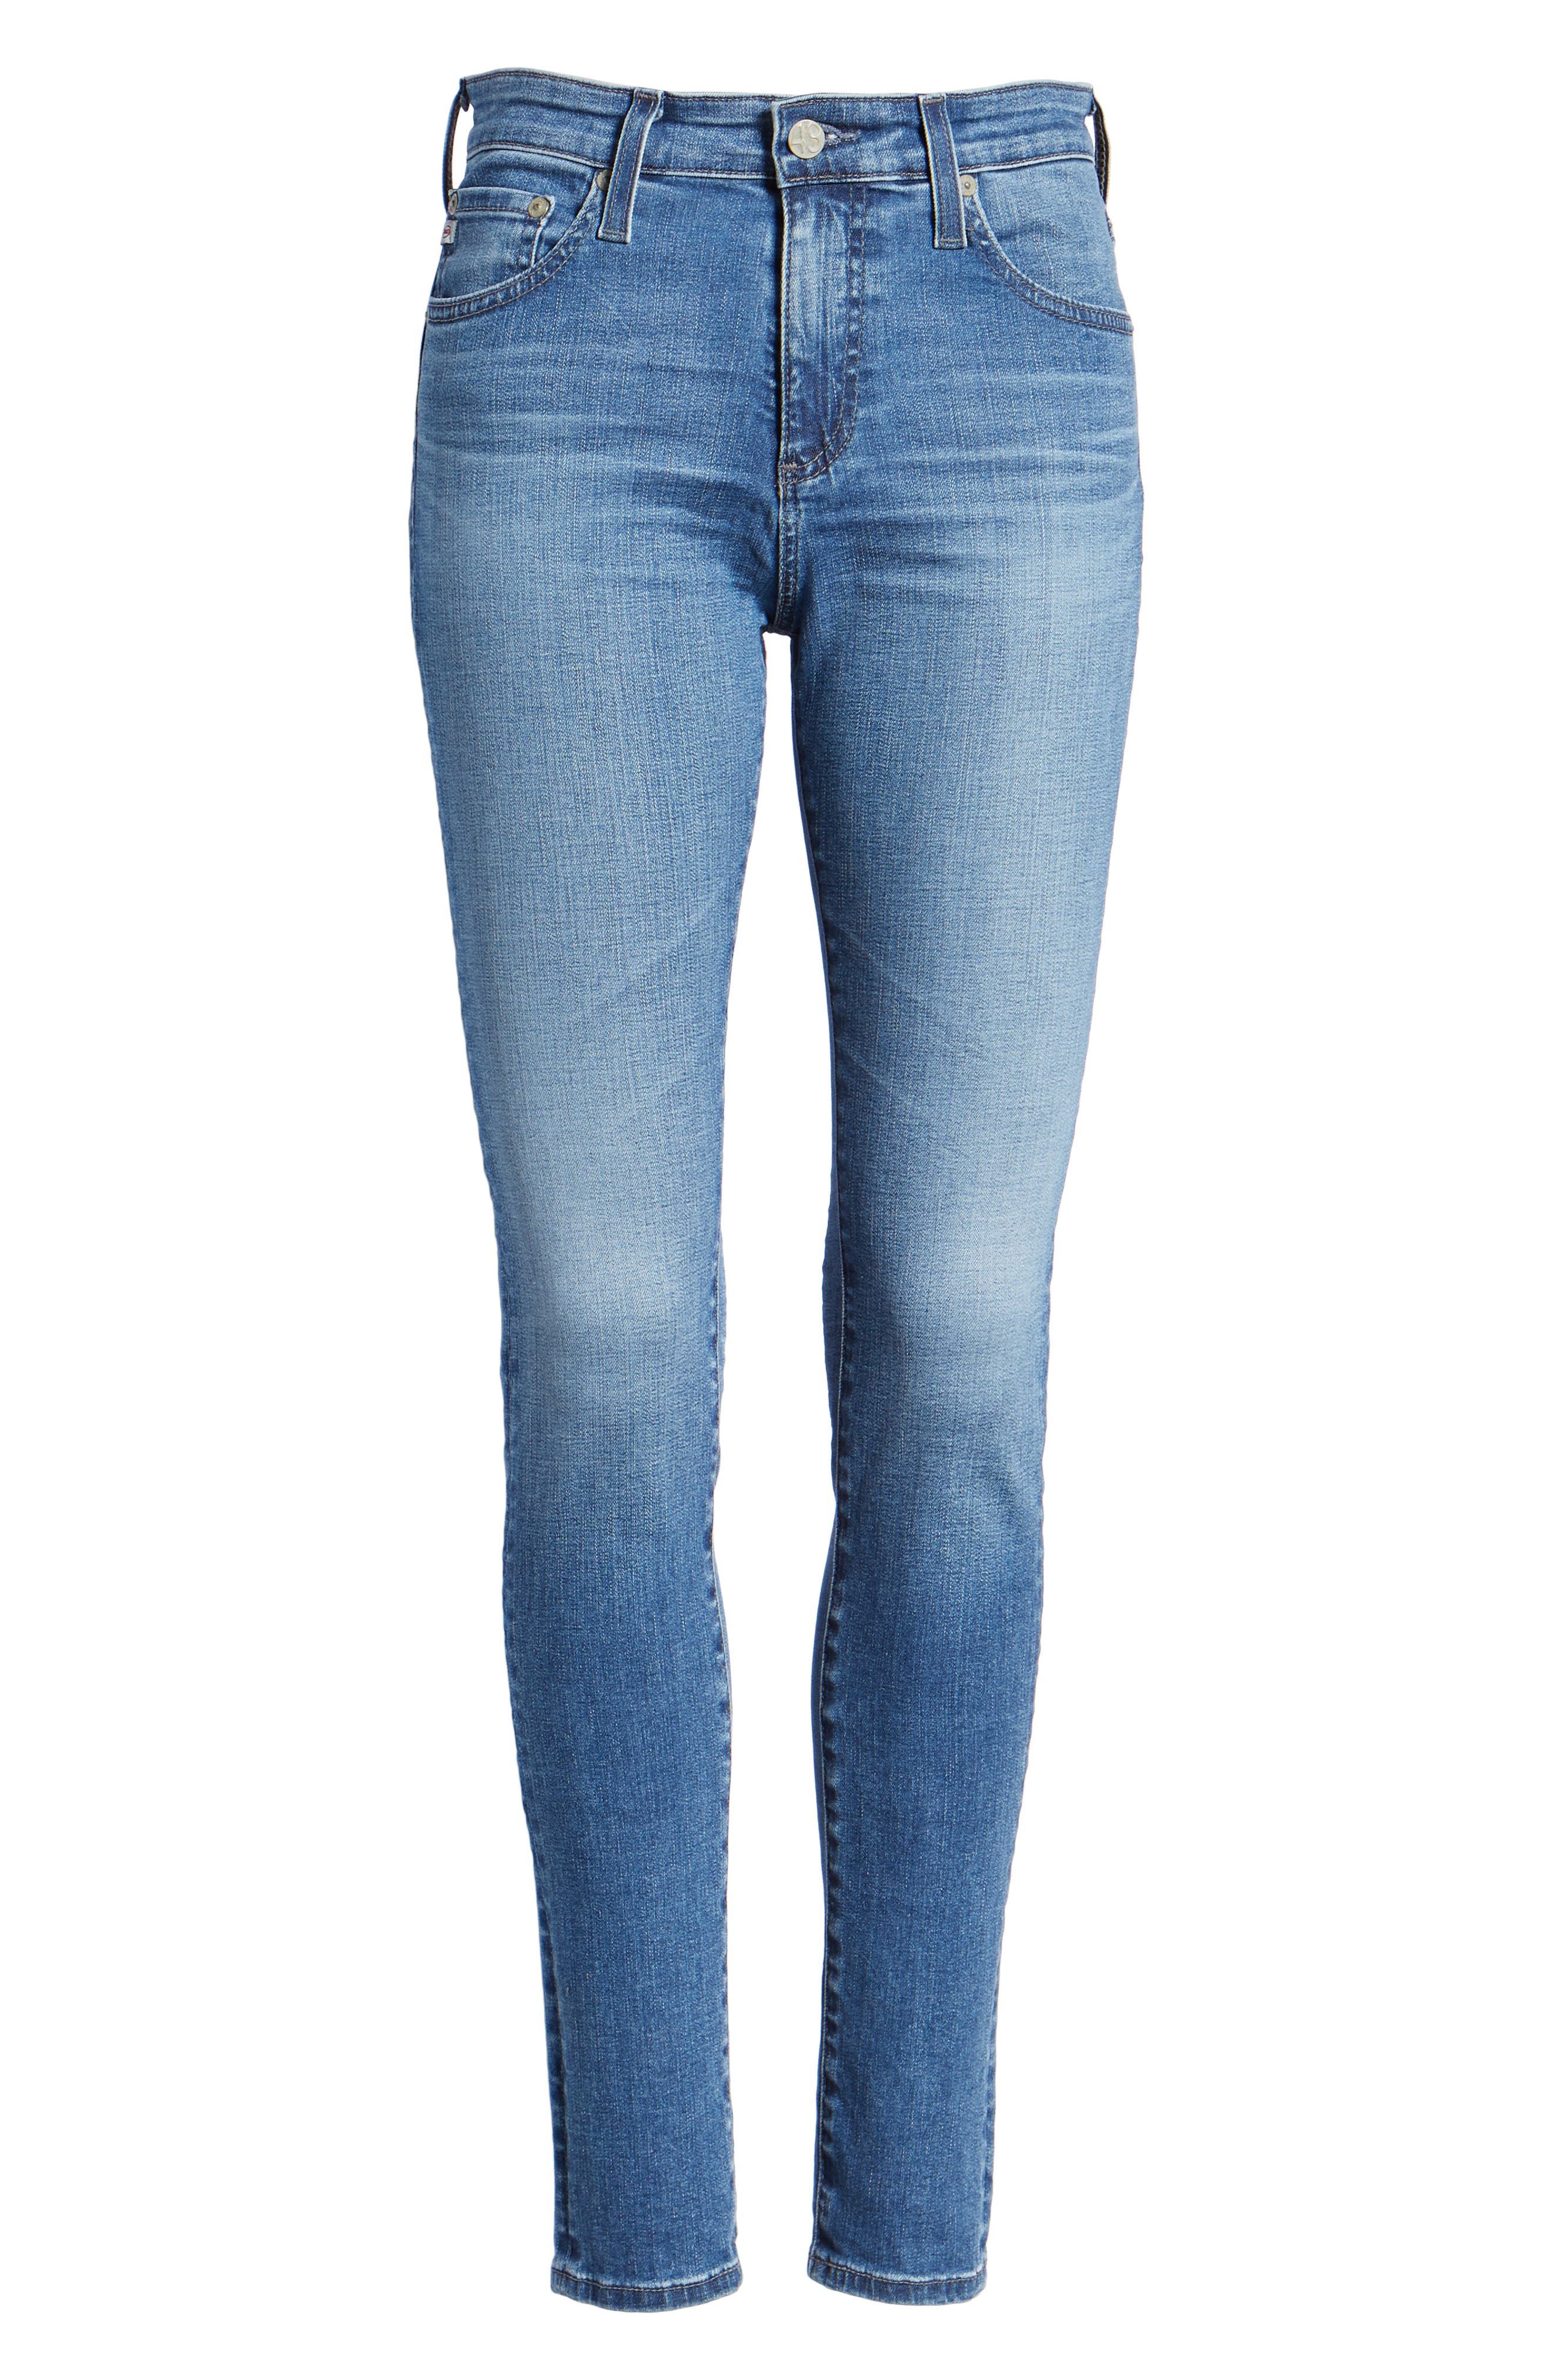 'The Farrah' High Rise Skinny Jeans,                             Alternate thumbnail 53, color,